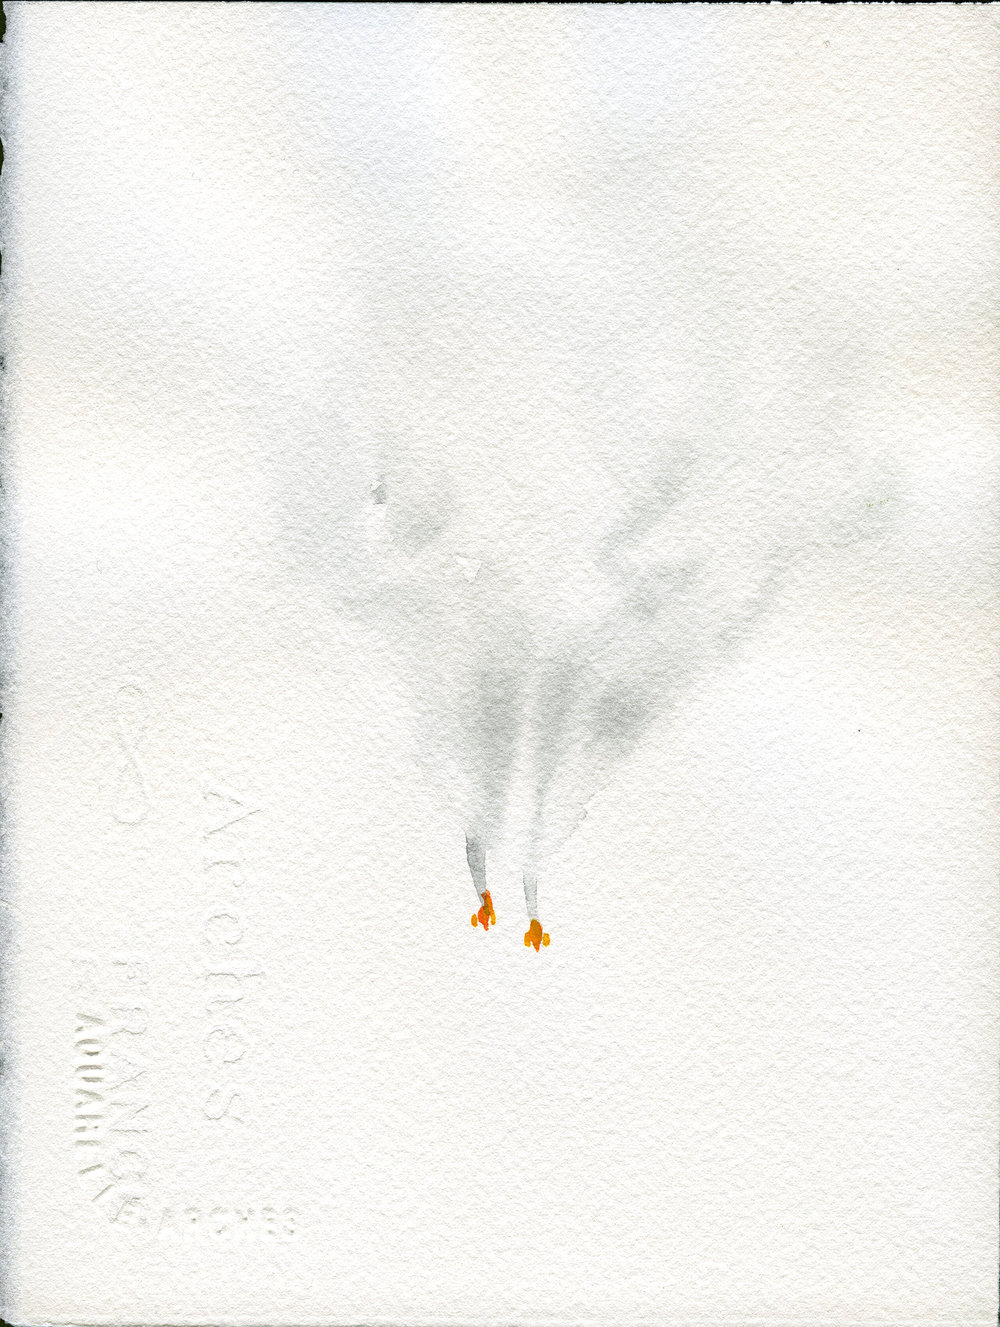 burn004.jpg